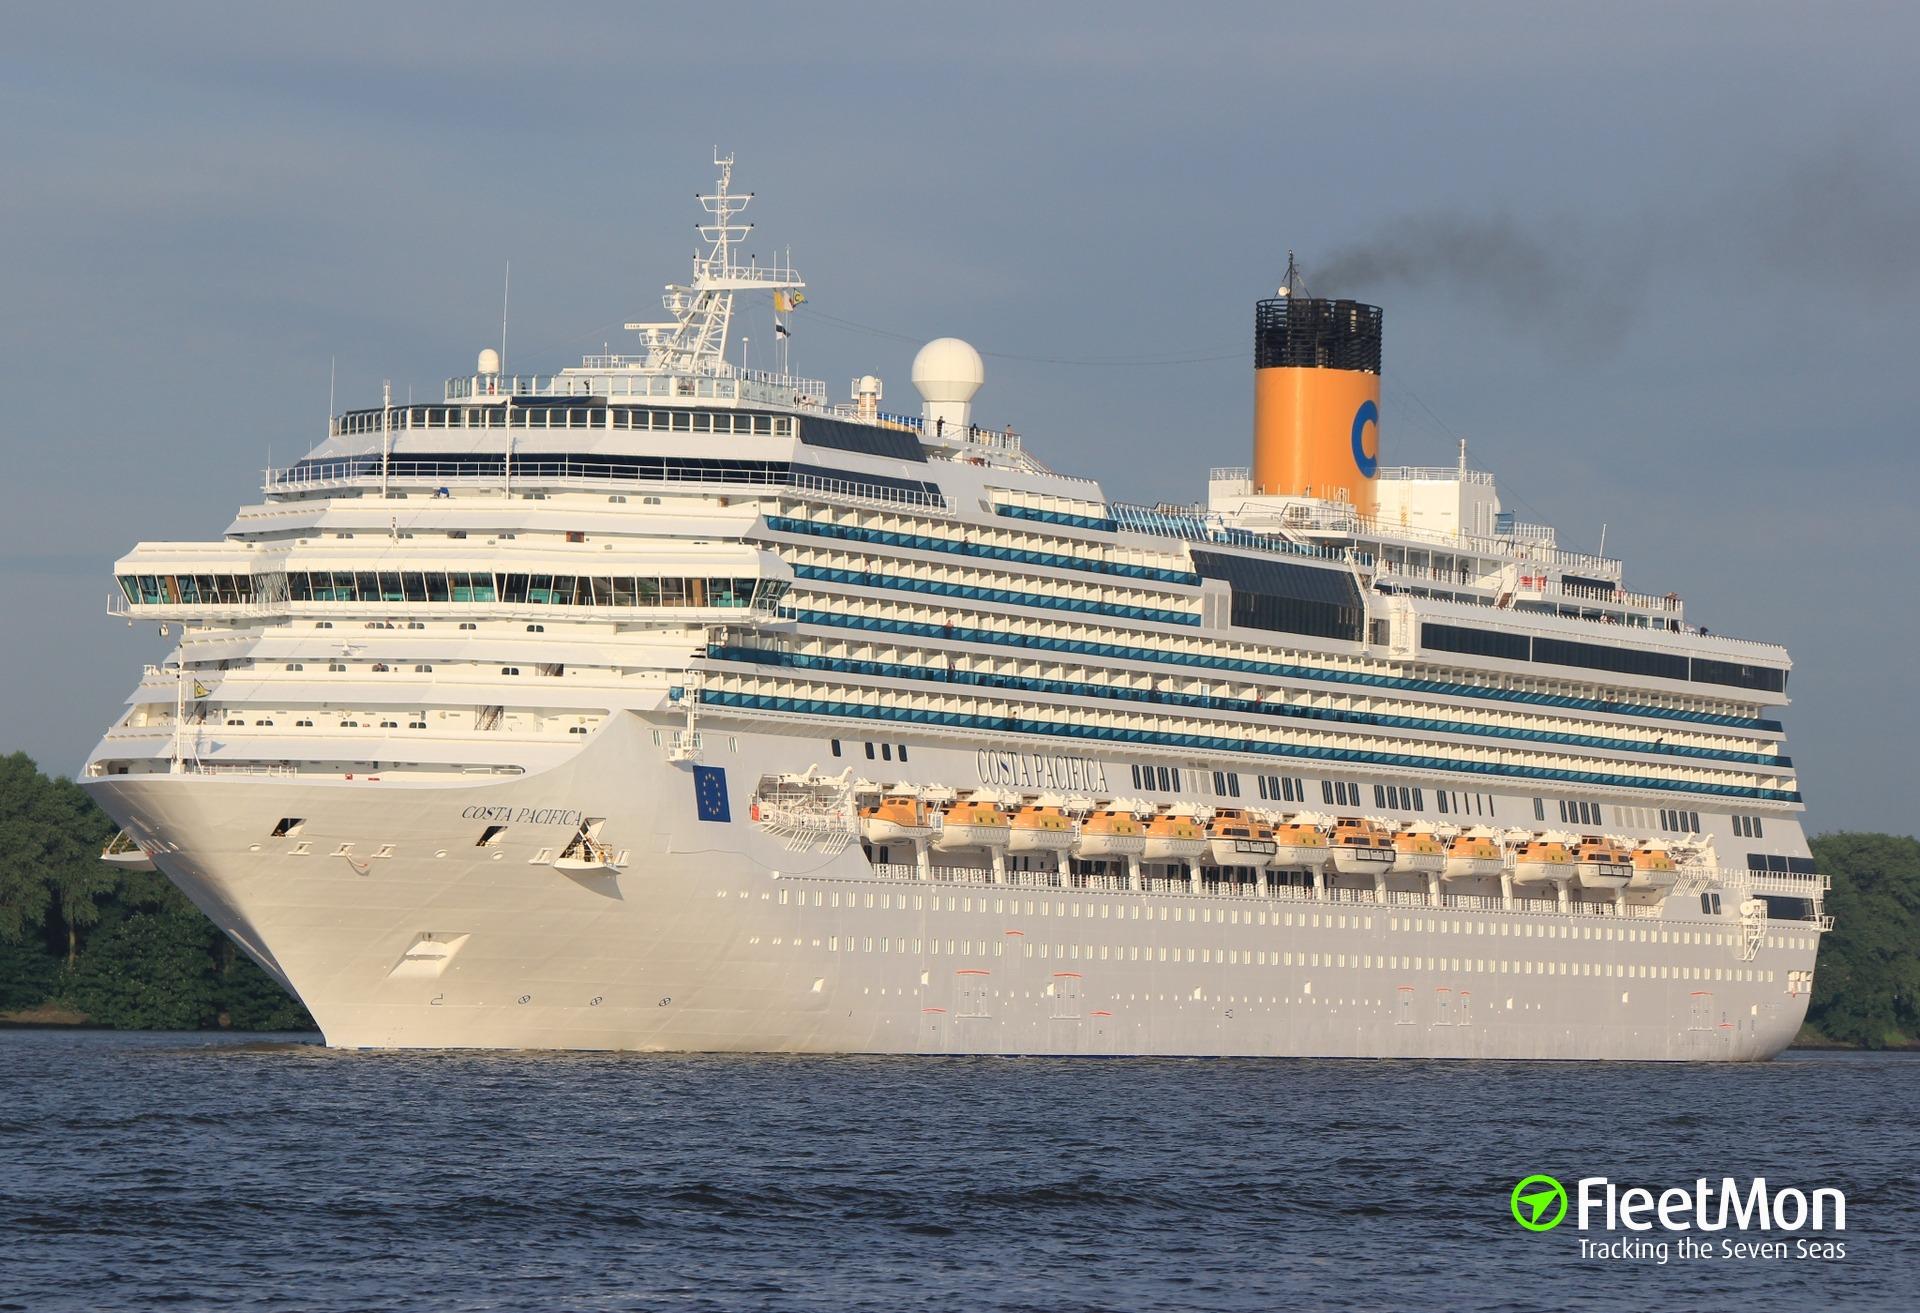 Cruise liner Costa Pacifica bruised entering Marseille